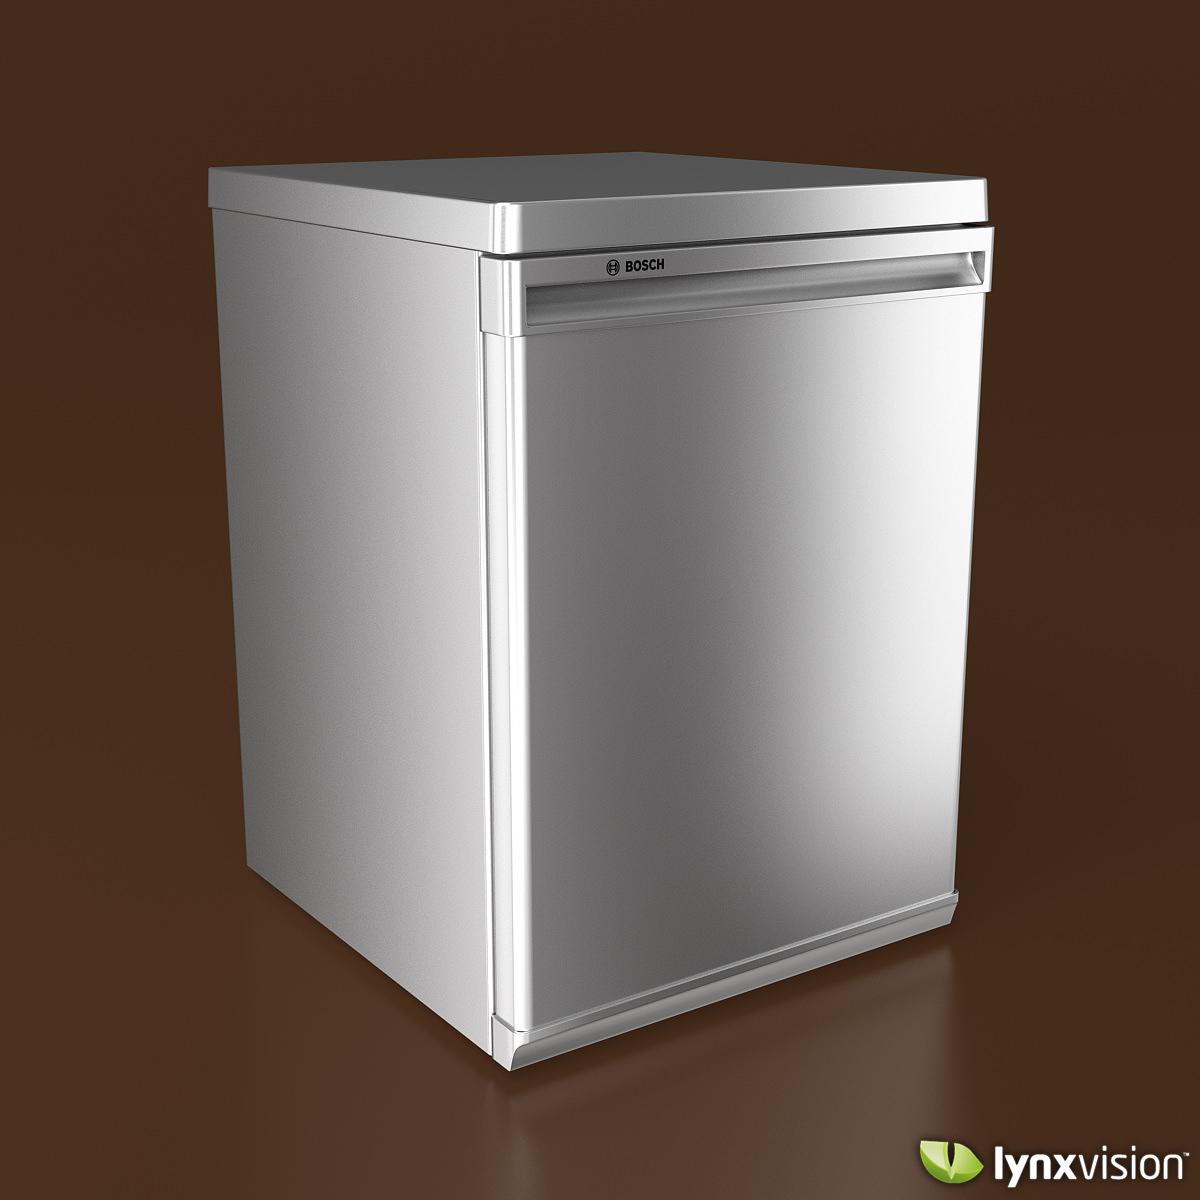 Bosch 500 Series Washer And Dryer Refrigerators Parts: Bosch Refrigerators